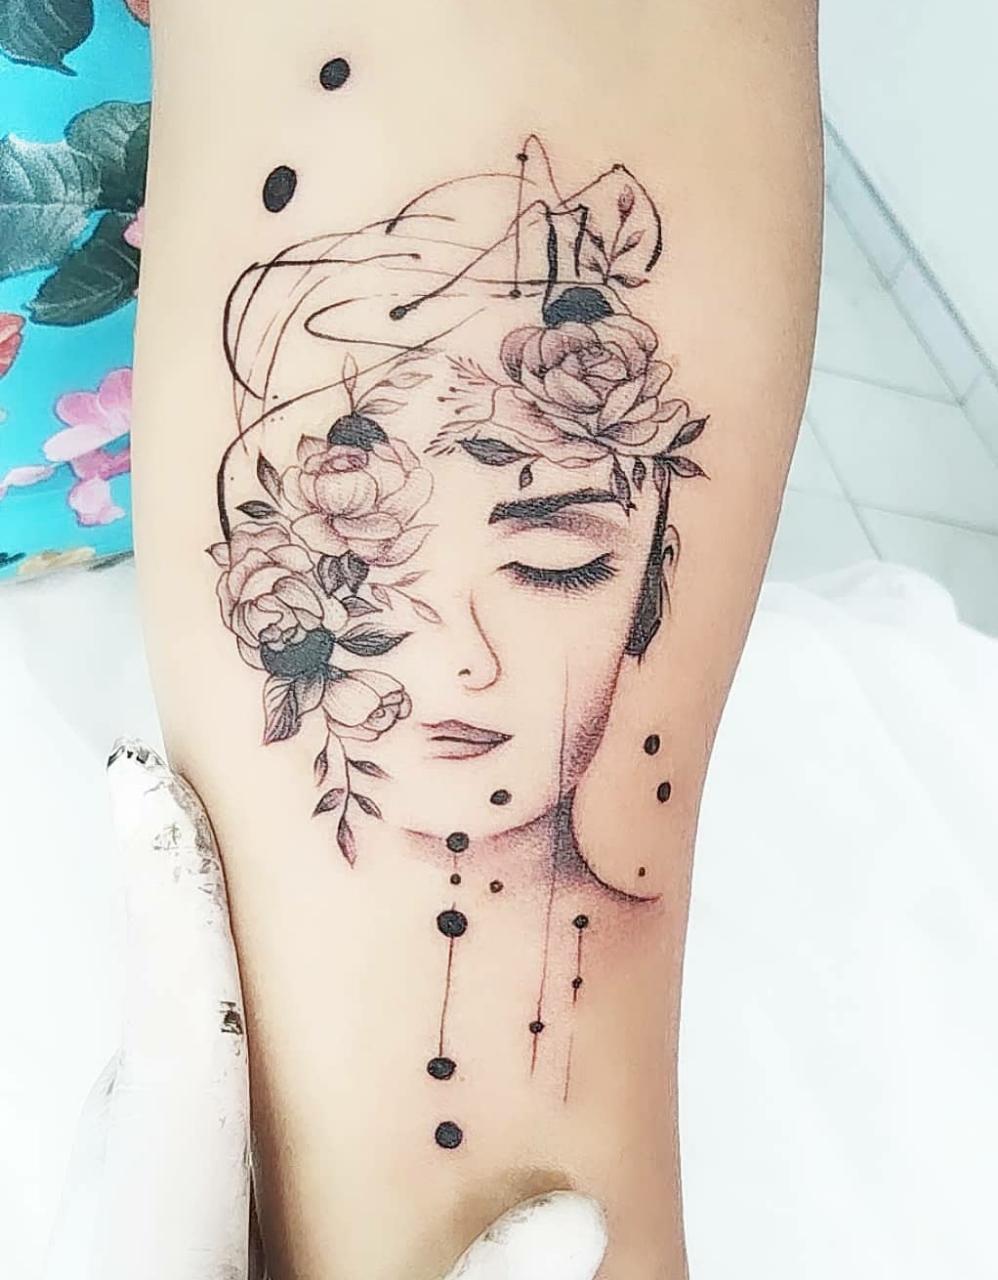 Studio de Tatuagem e Piercing Tynna Bolford